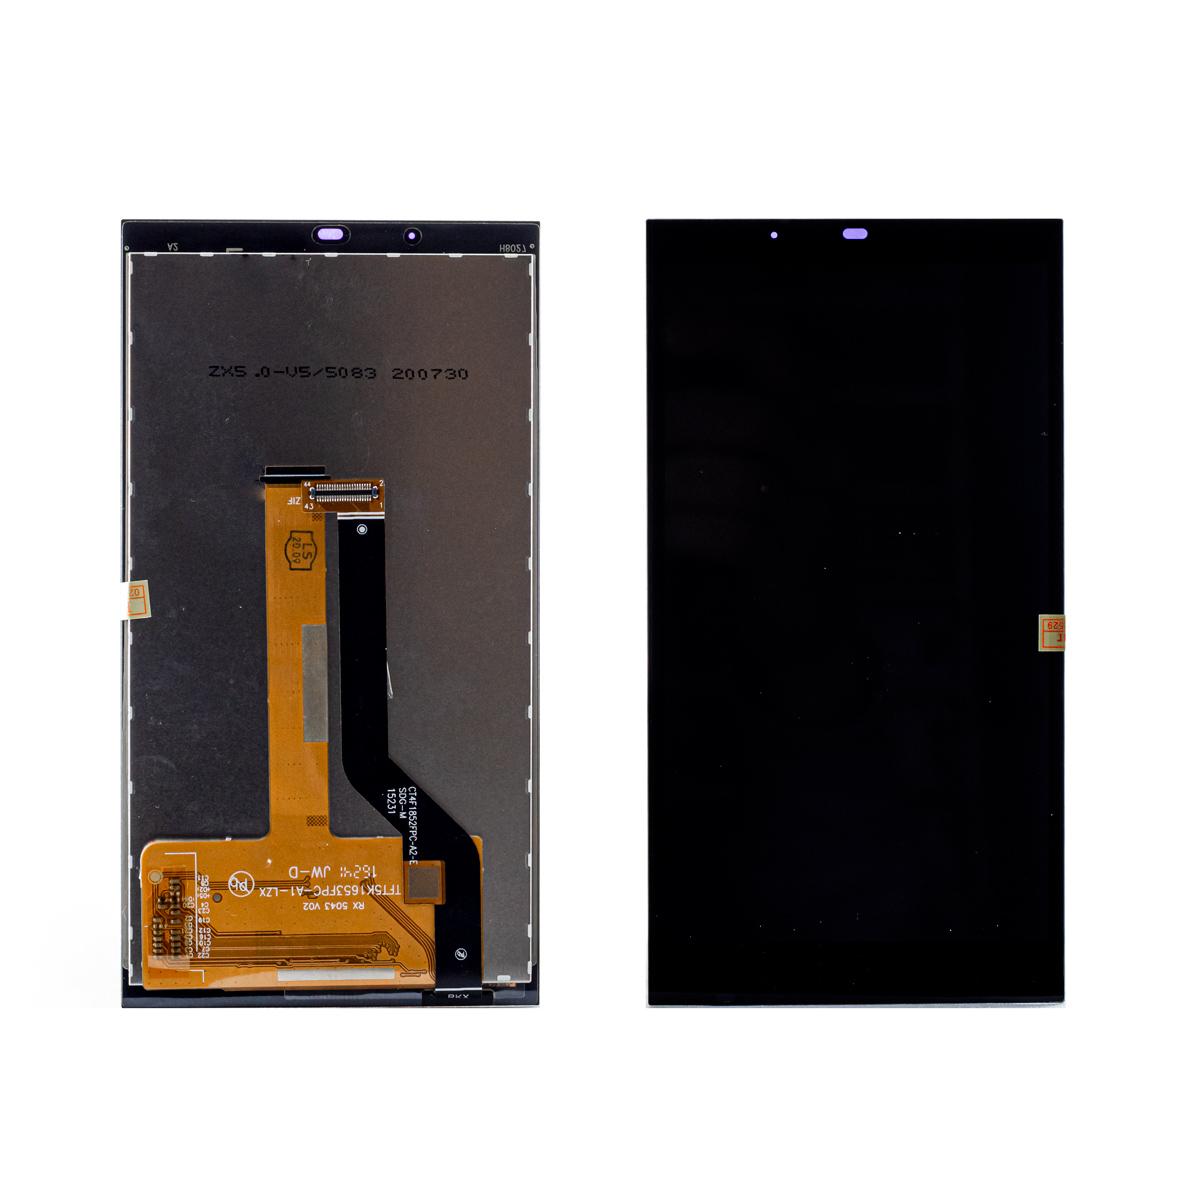 ال سی دی LCD DESIRE 626